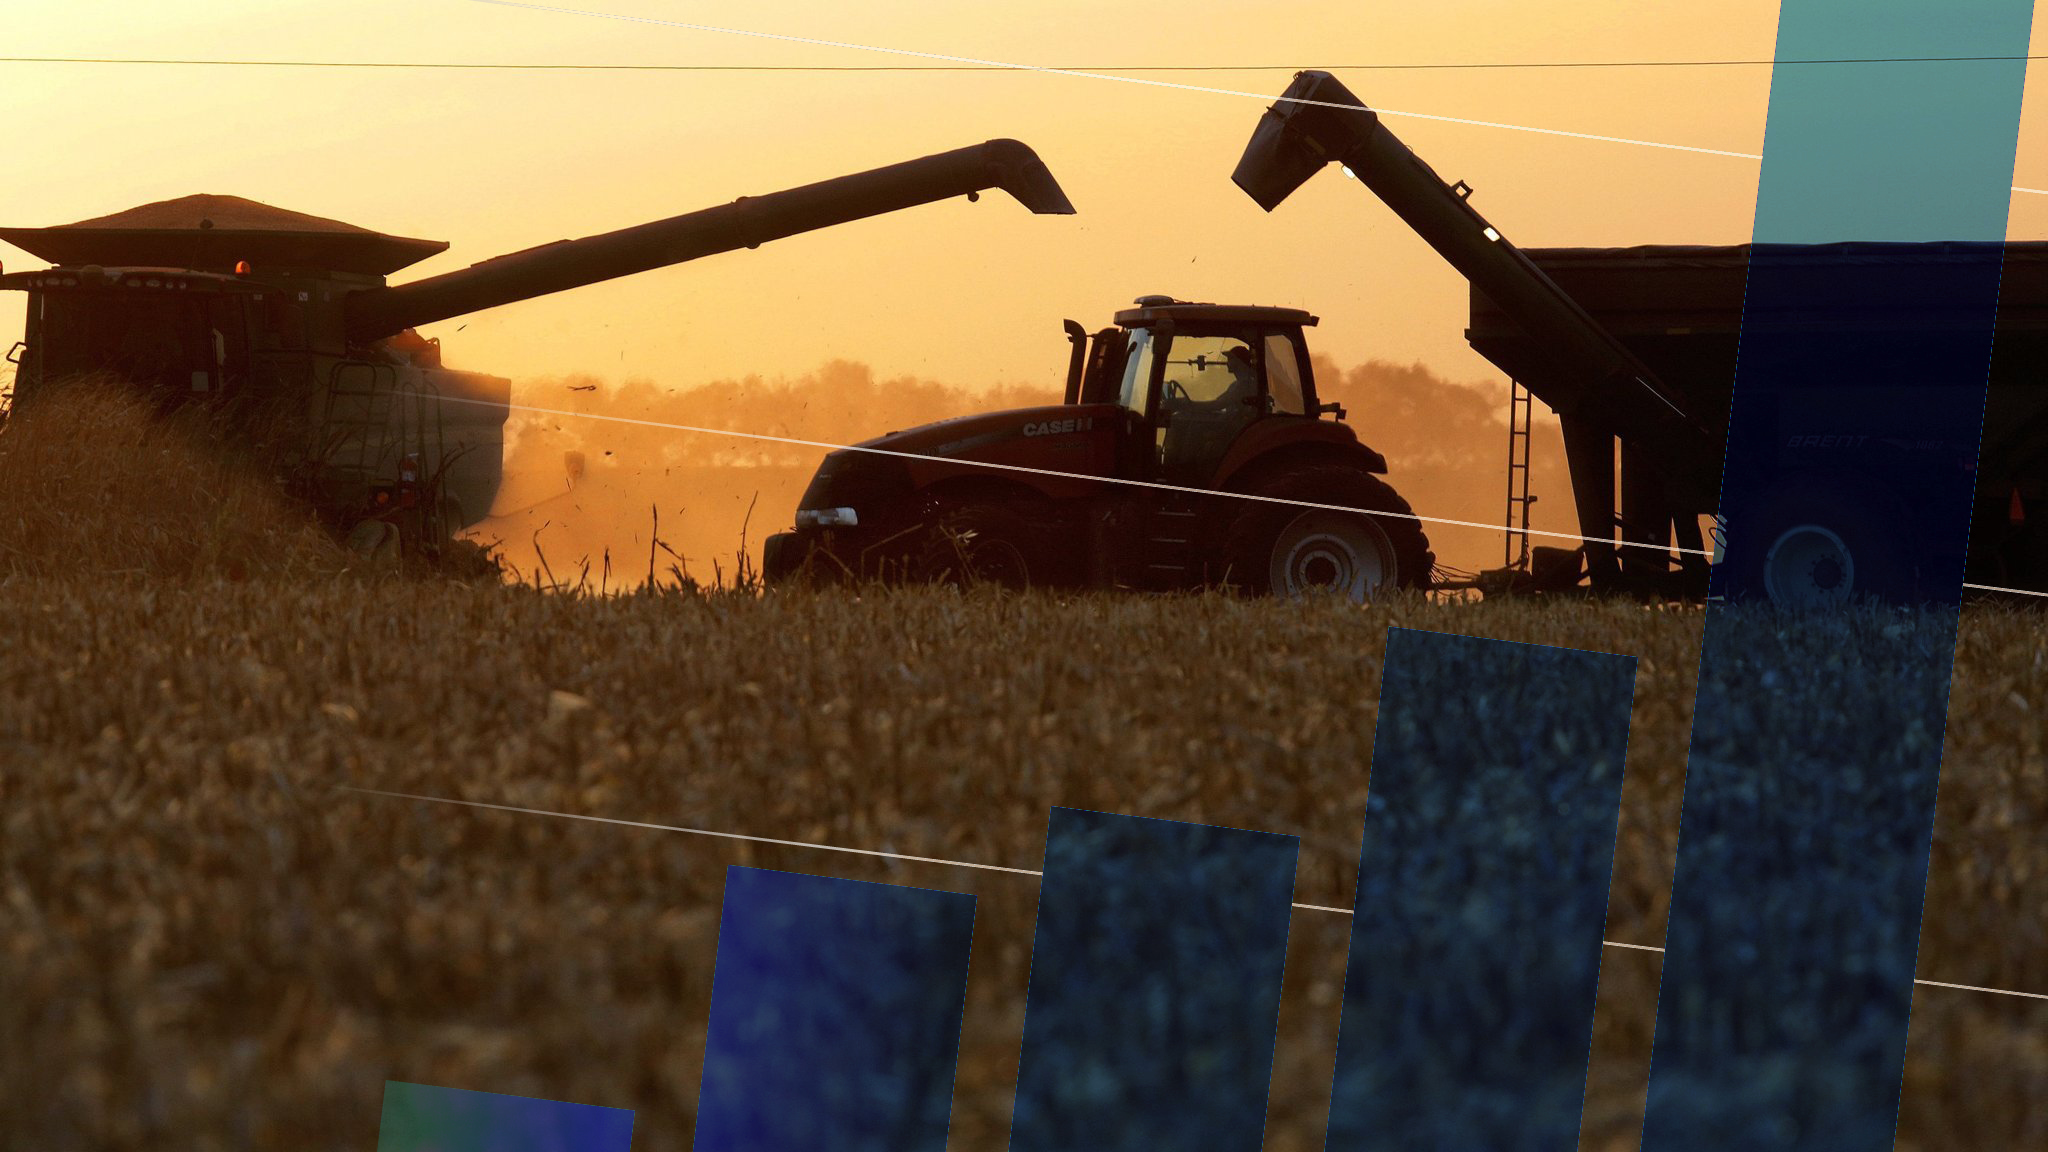 Ag tech fundraising doubles as farmers seek disruptive